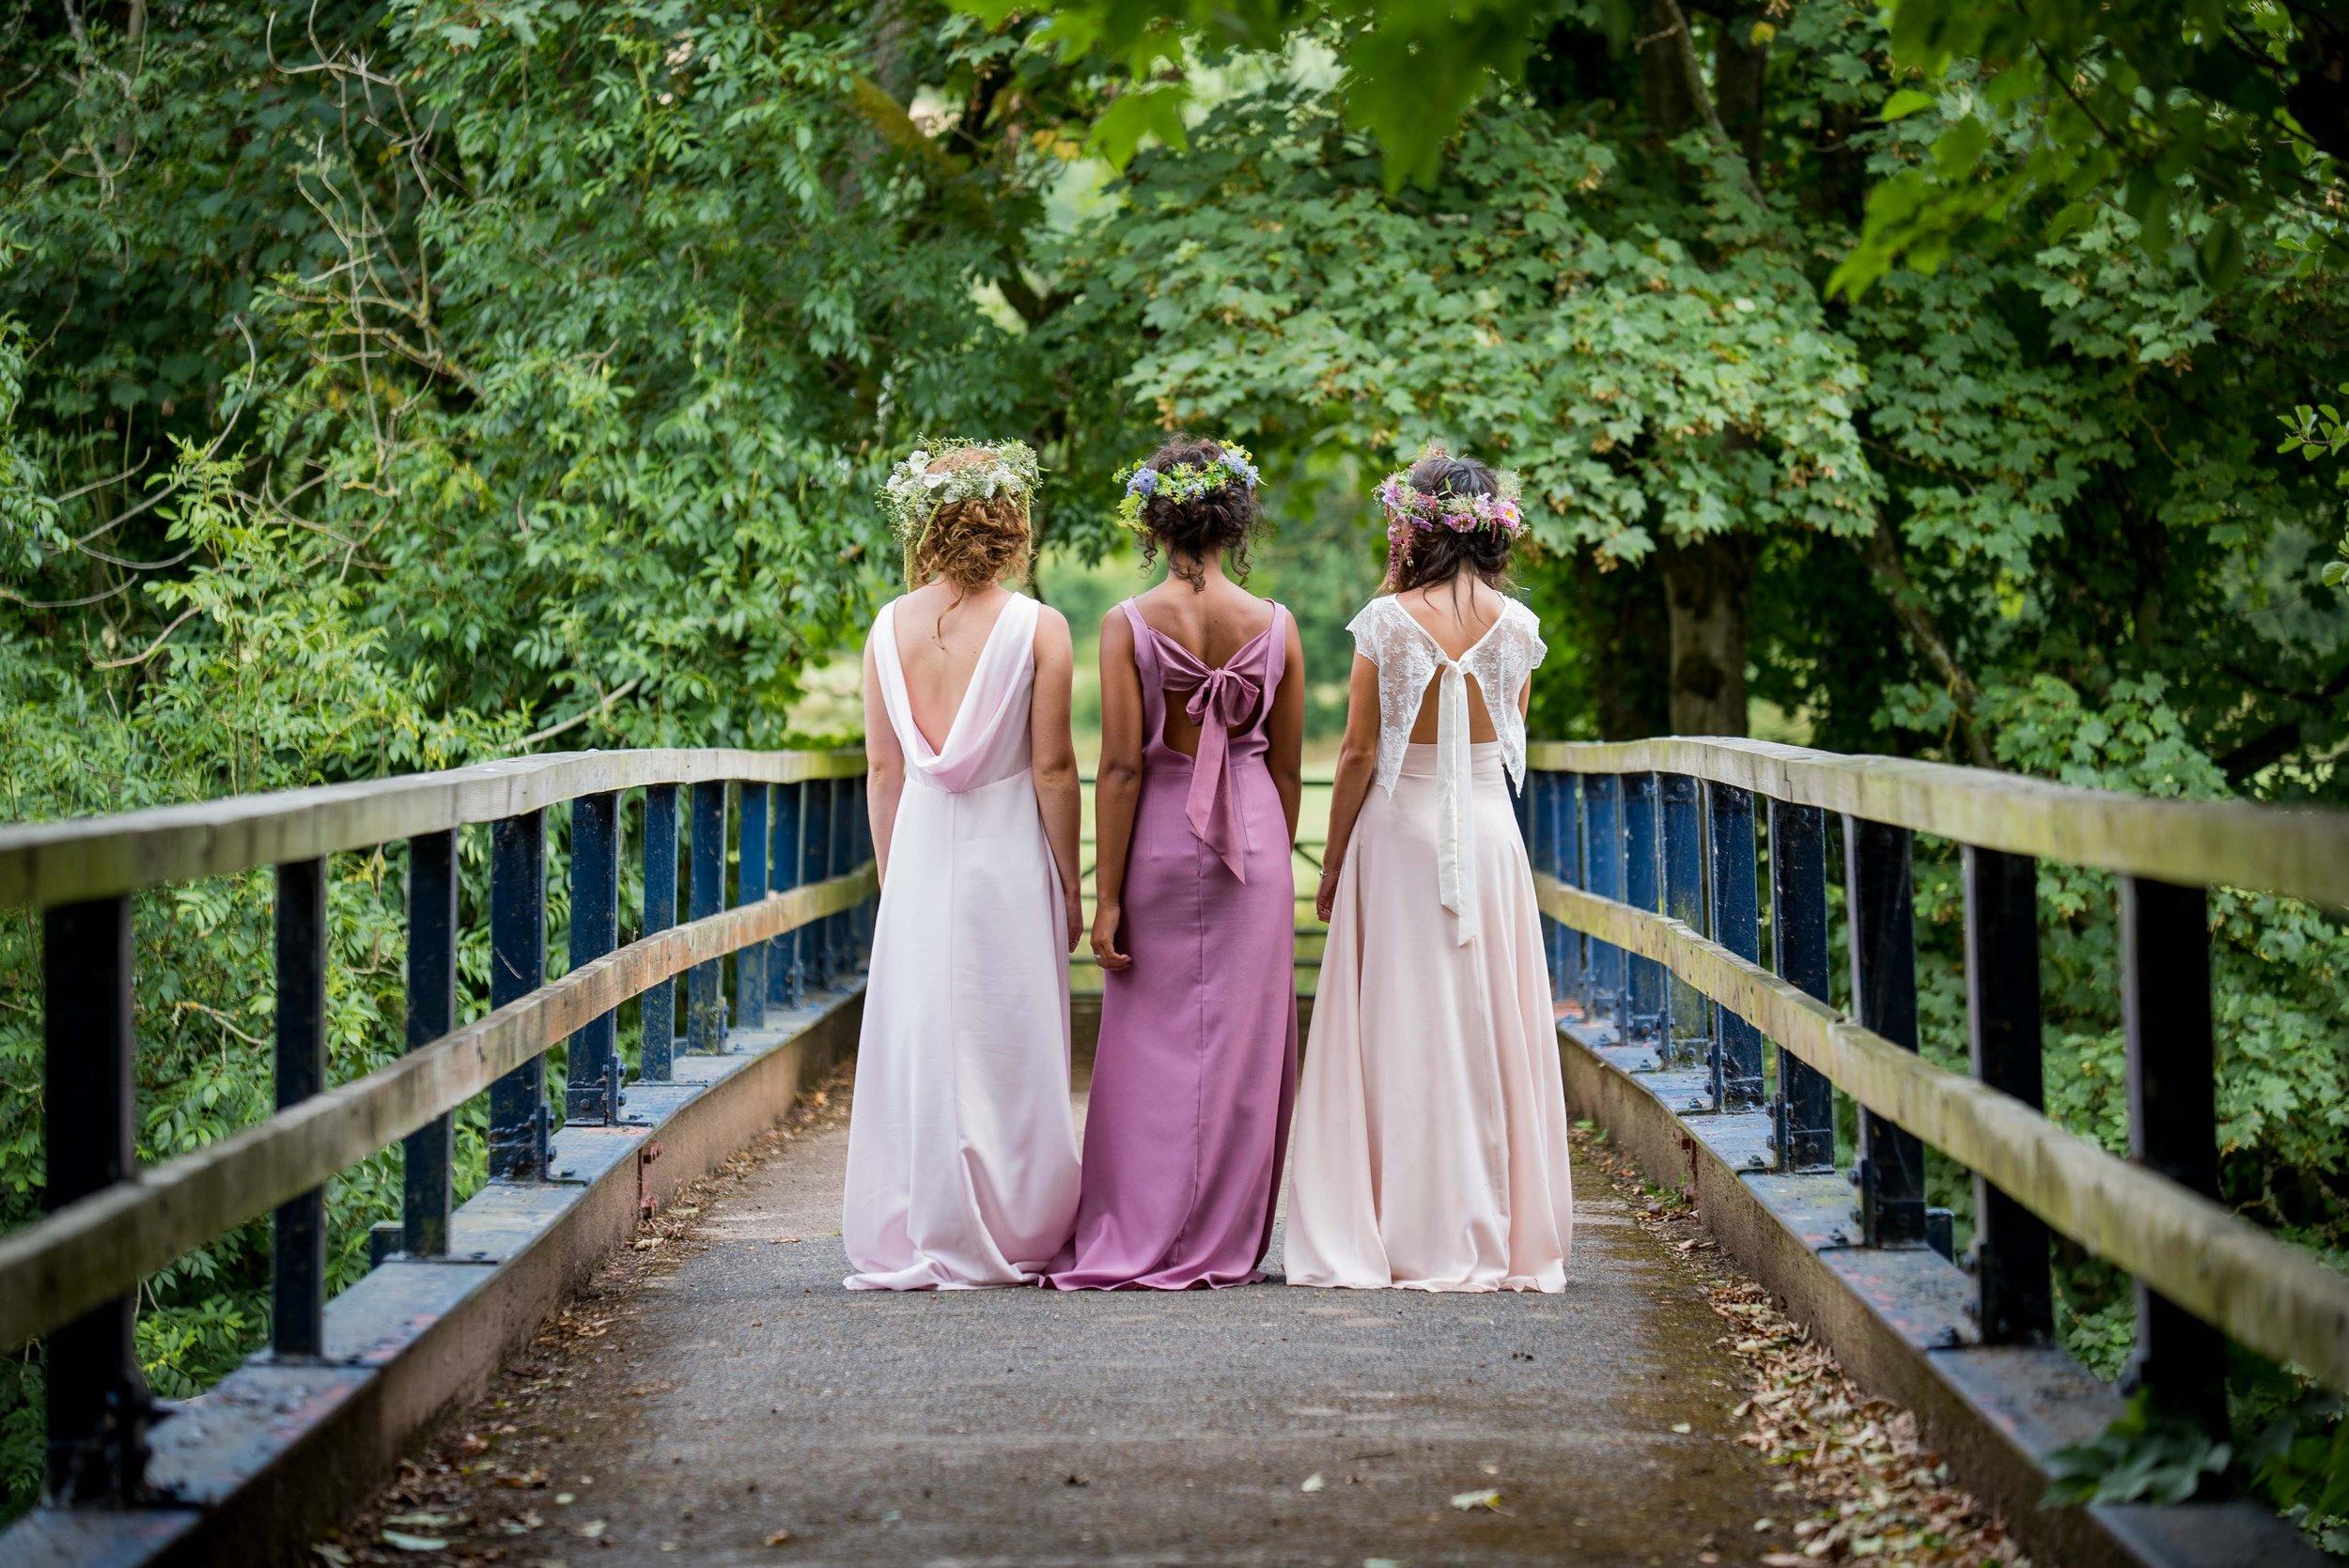 Ashleigh dress £185 | Eleanore dress £165